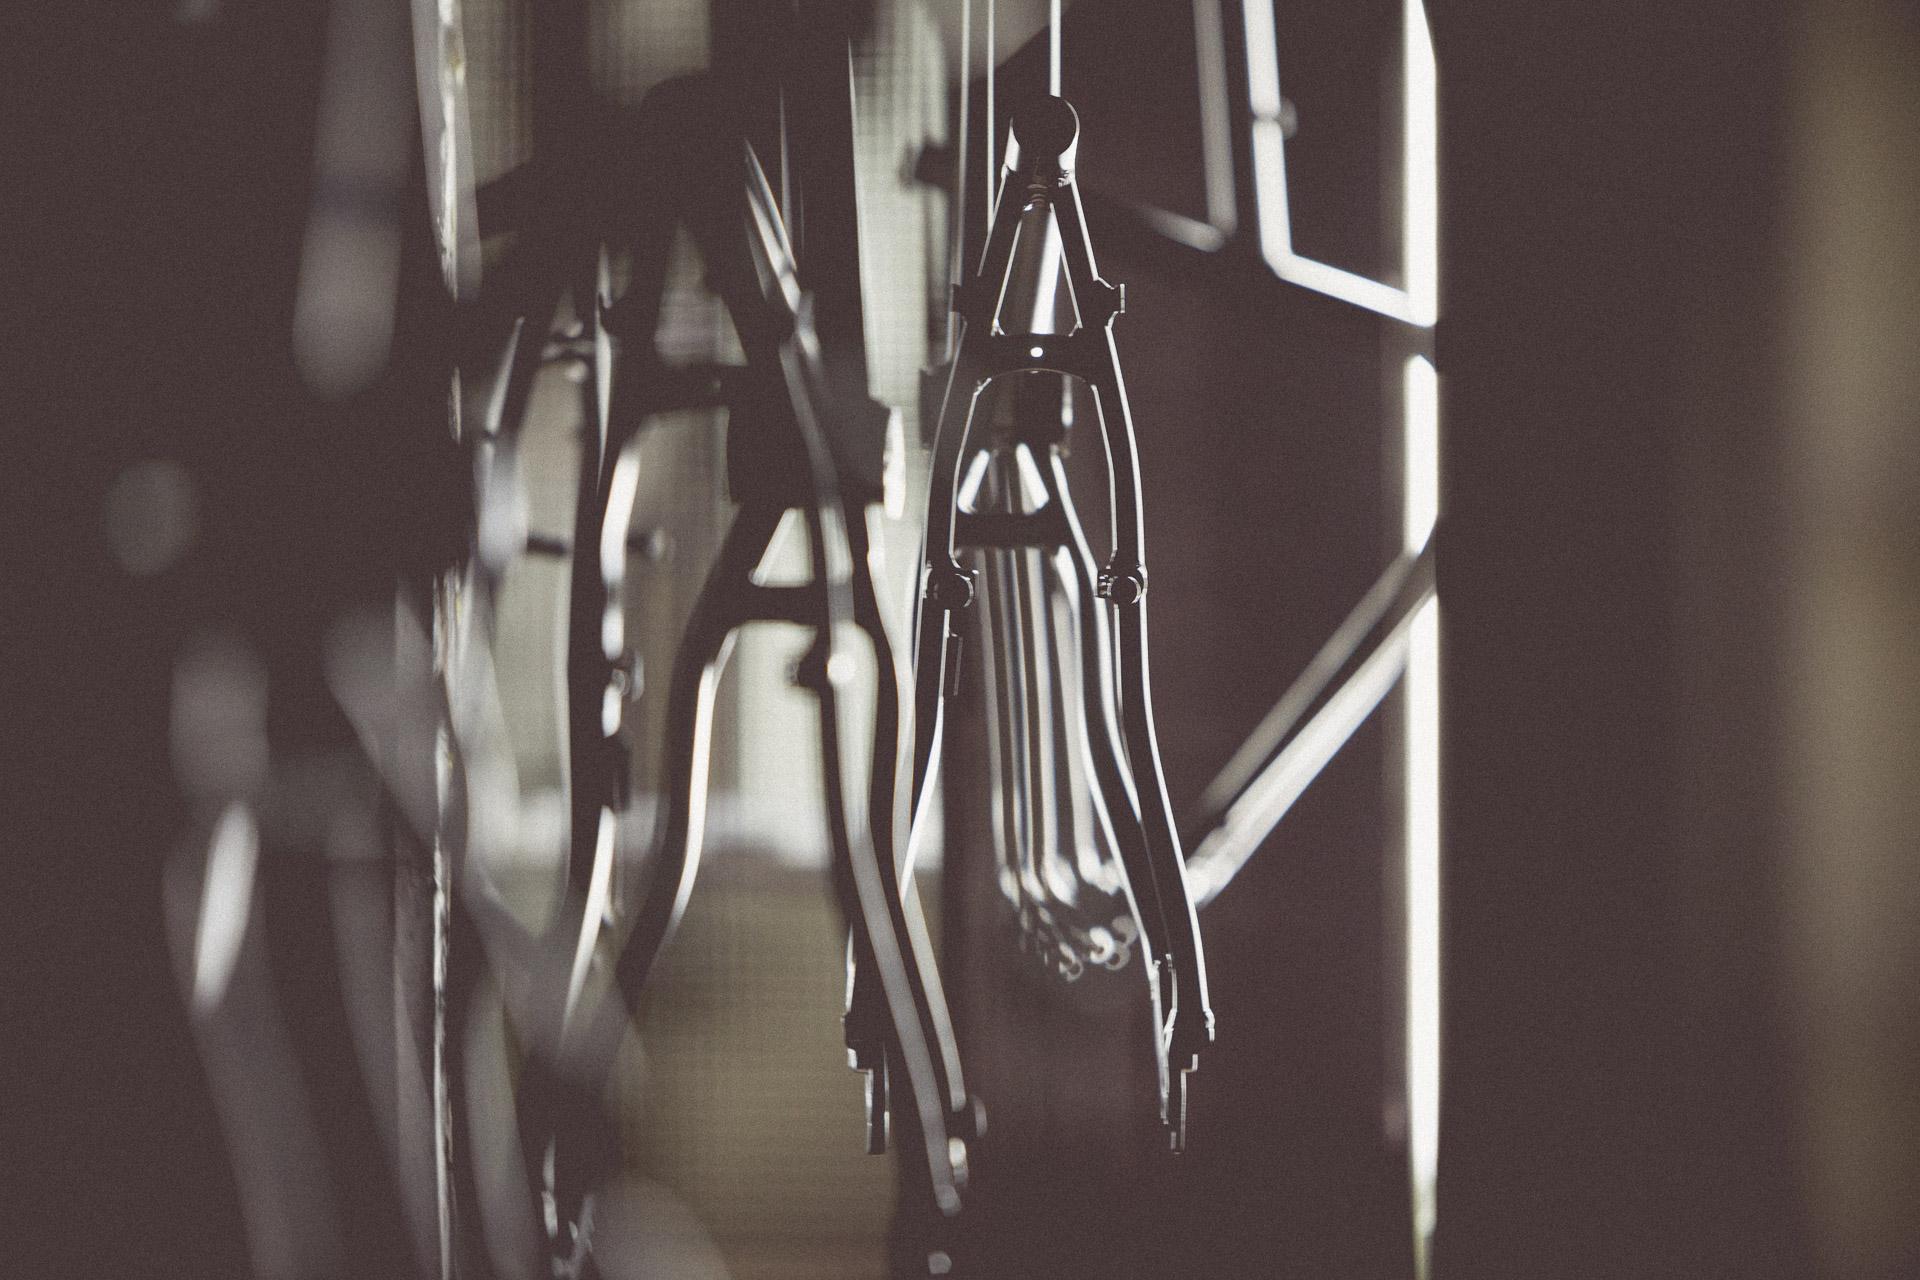 11-Derby-Cycle-Werke-Fahrradproduktion